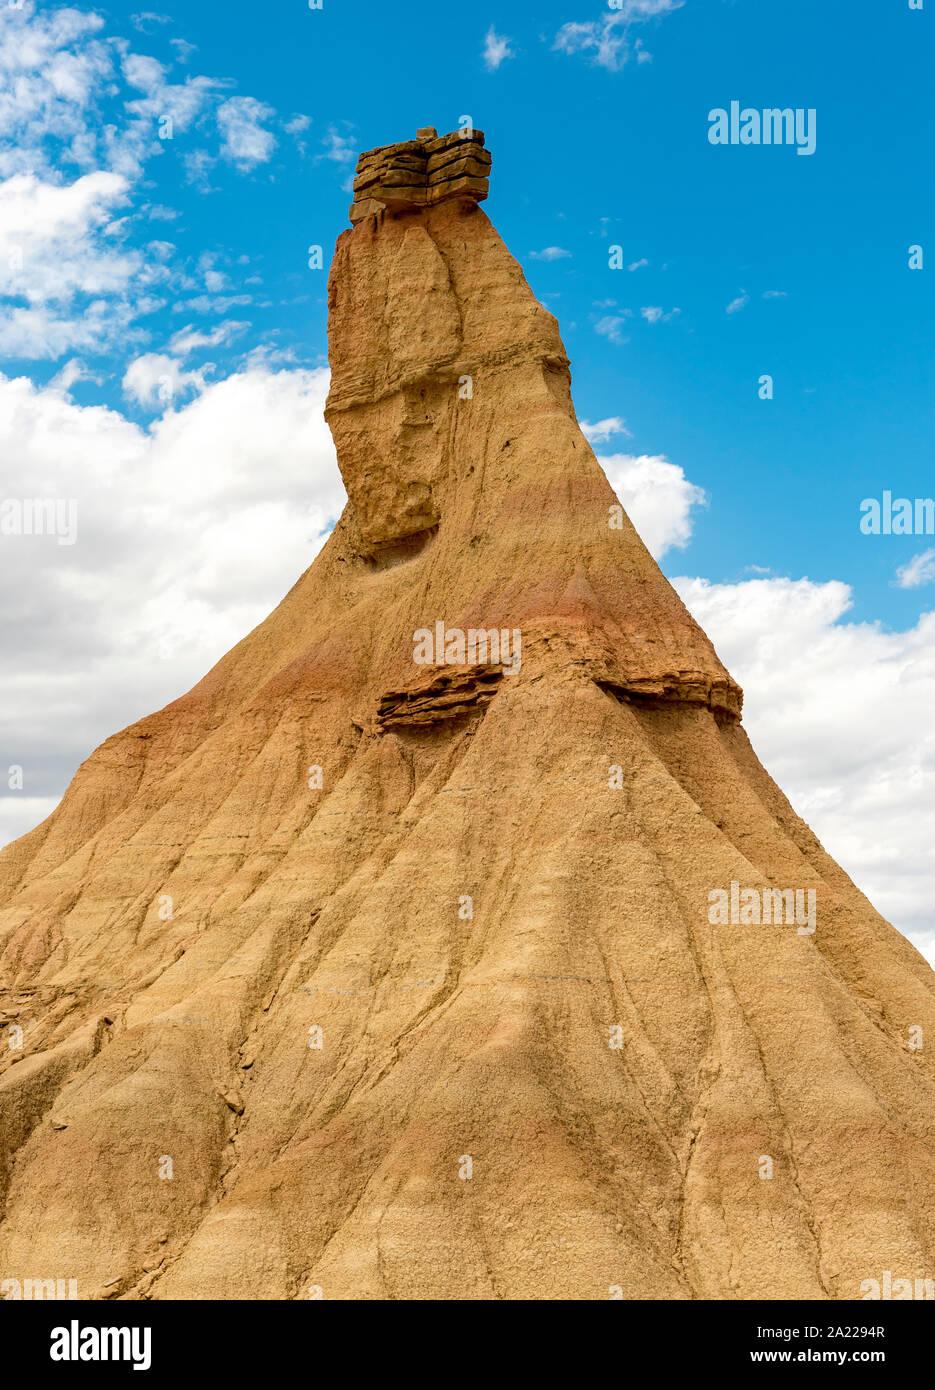 Castil de Tierra (Castildetierra) formazione di roccia, Bardenas Reales Desert, Navarra, Spagna Foto Stock